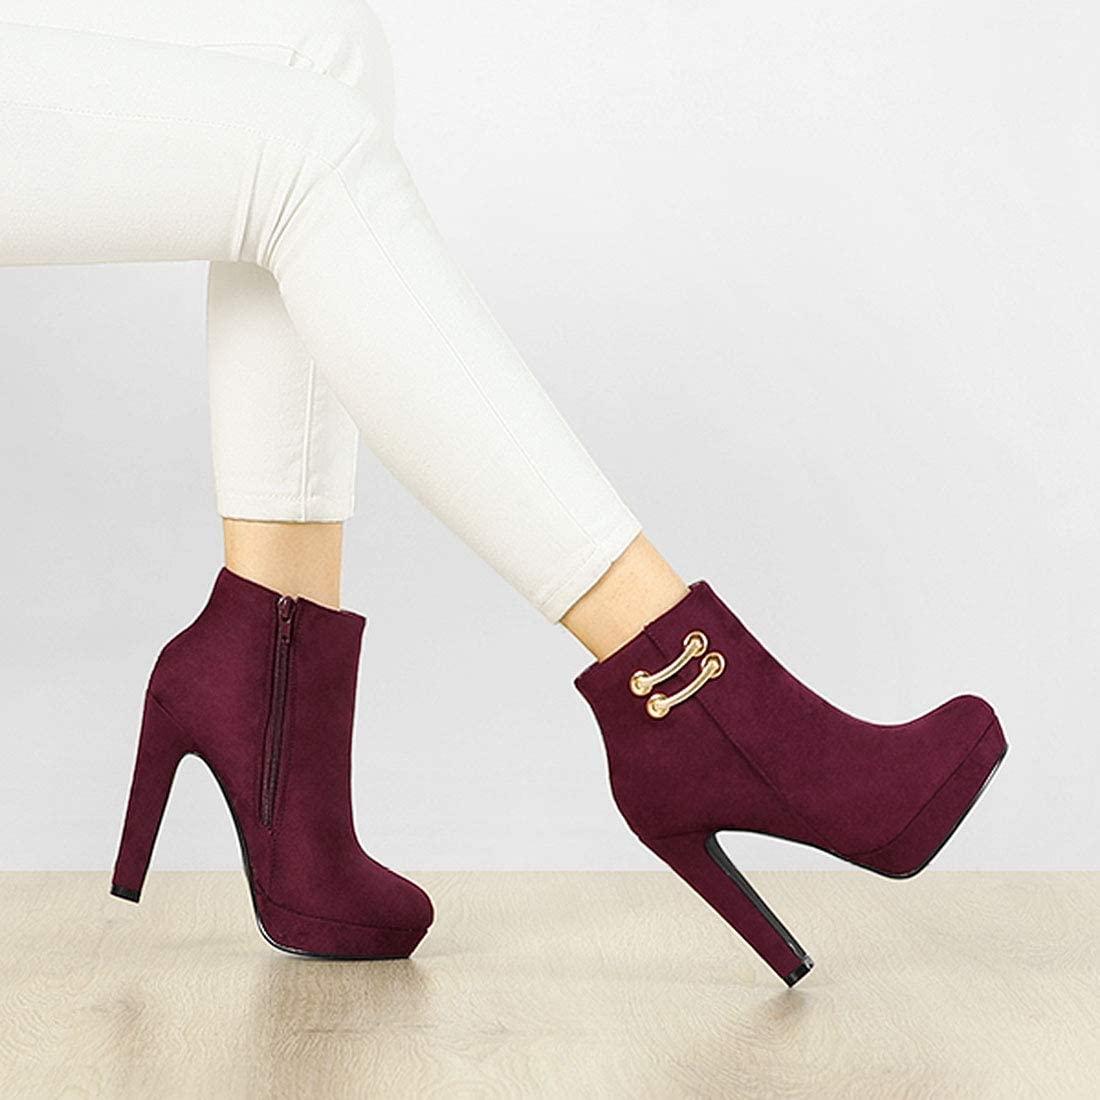 Allegra K Women's Round Toe Chunky High Heel Platform Ankle Boots